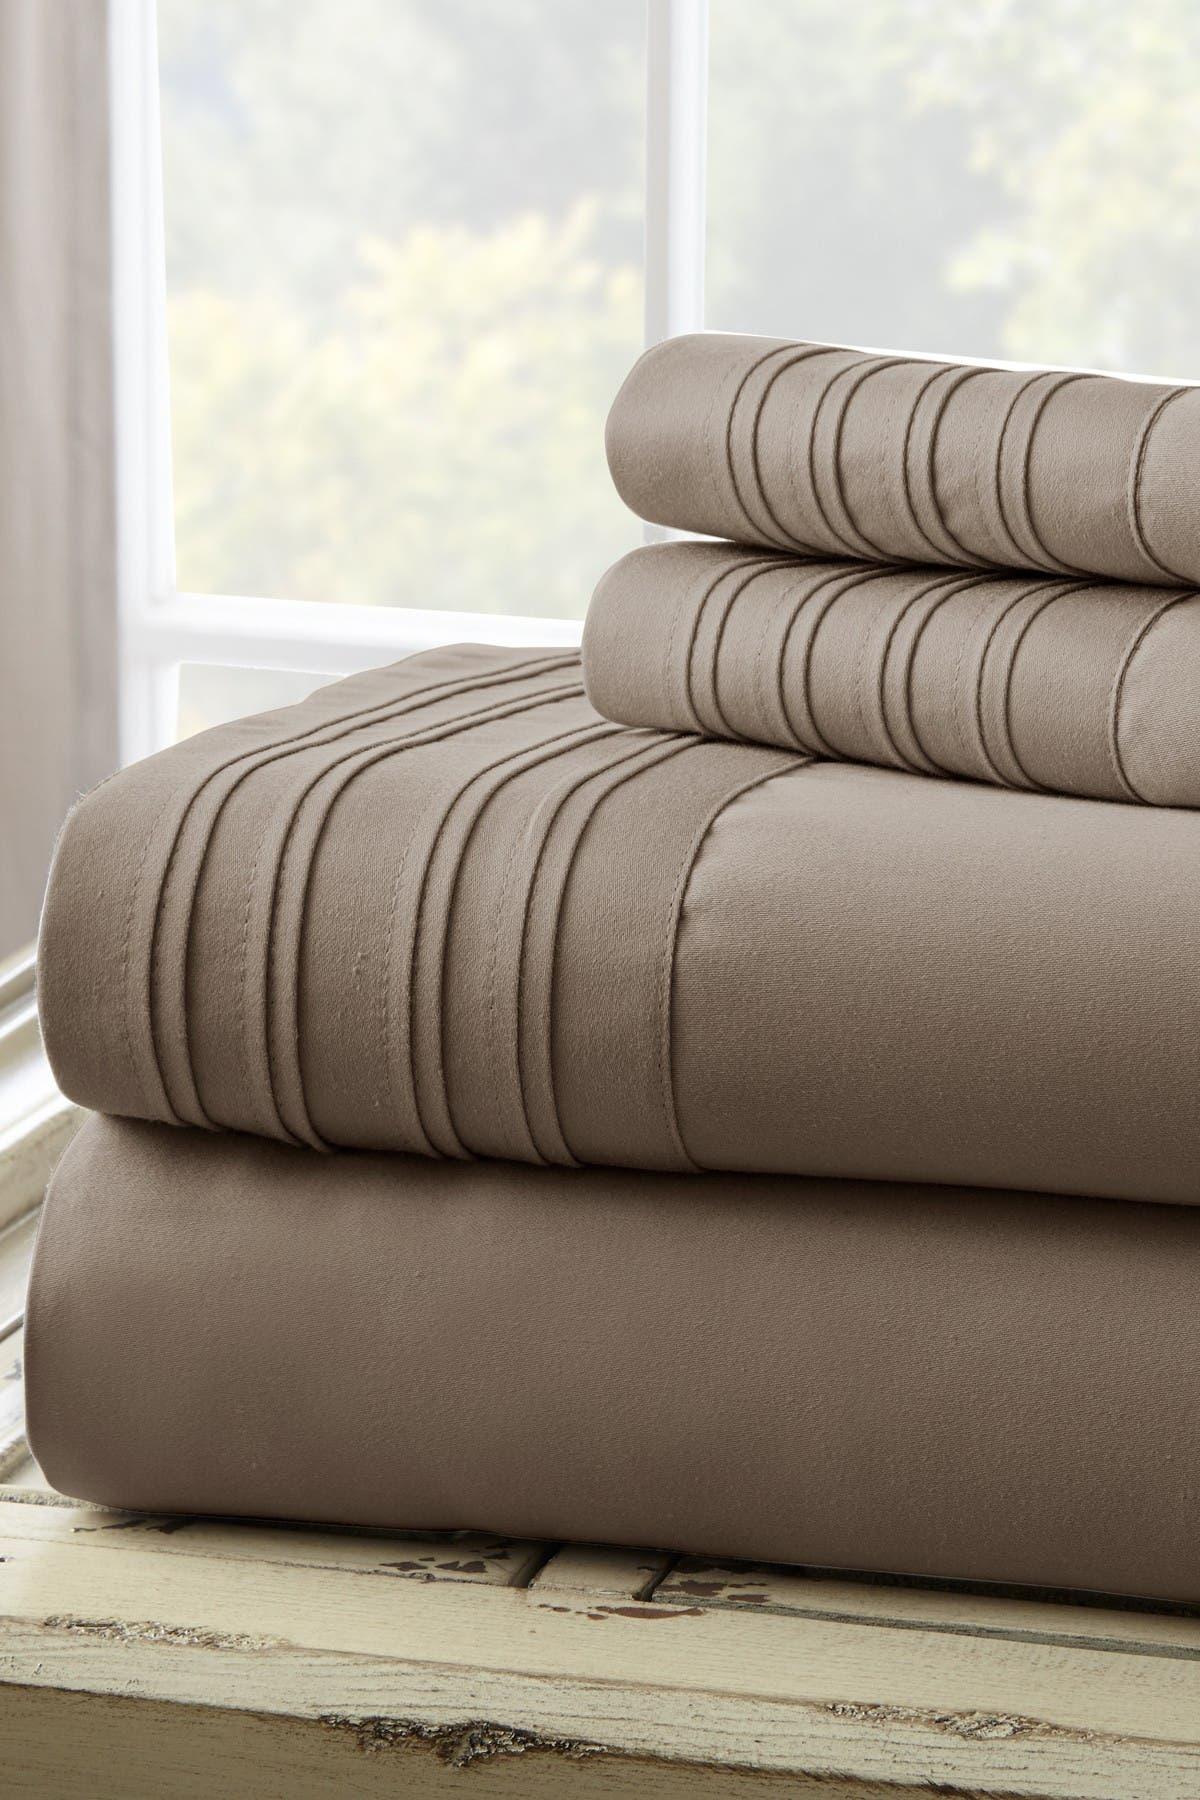 Image of Modern Threads Pleated Hem King 4-Piece Sheet Set - Grey